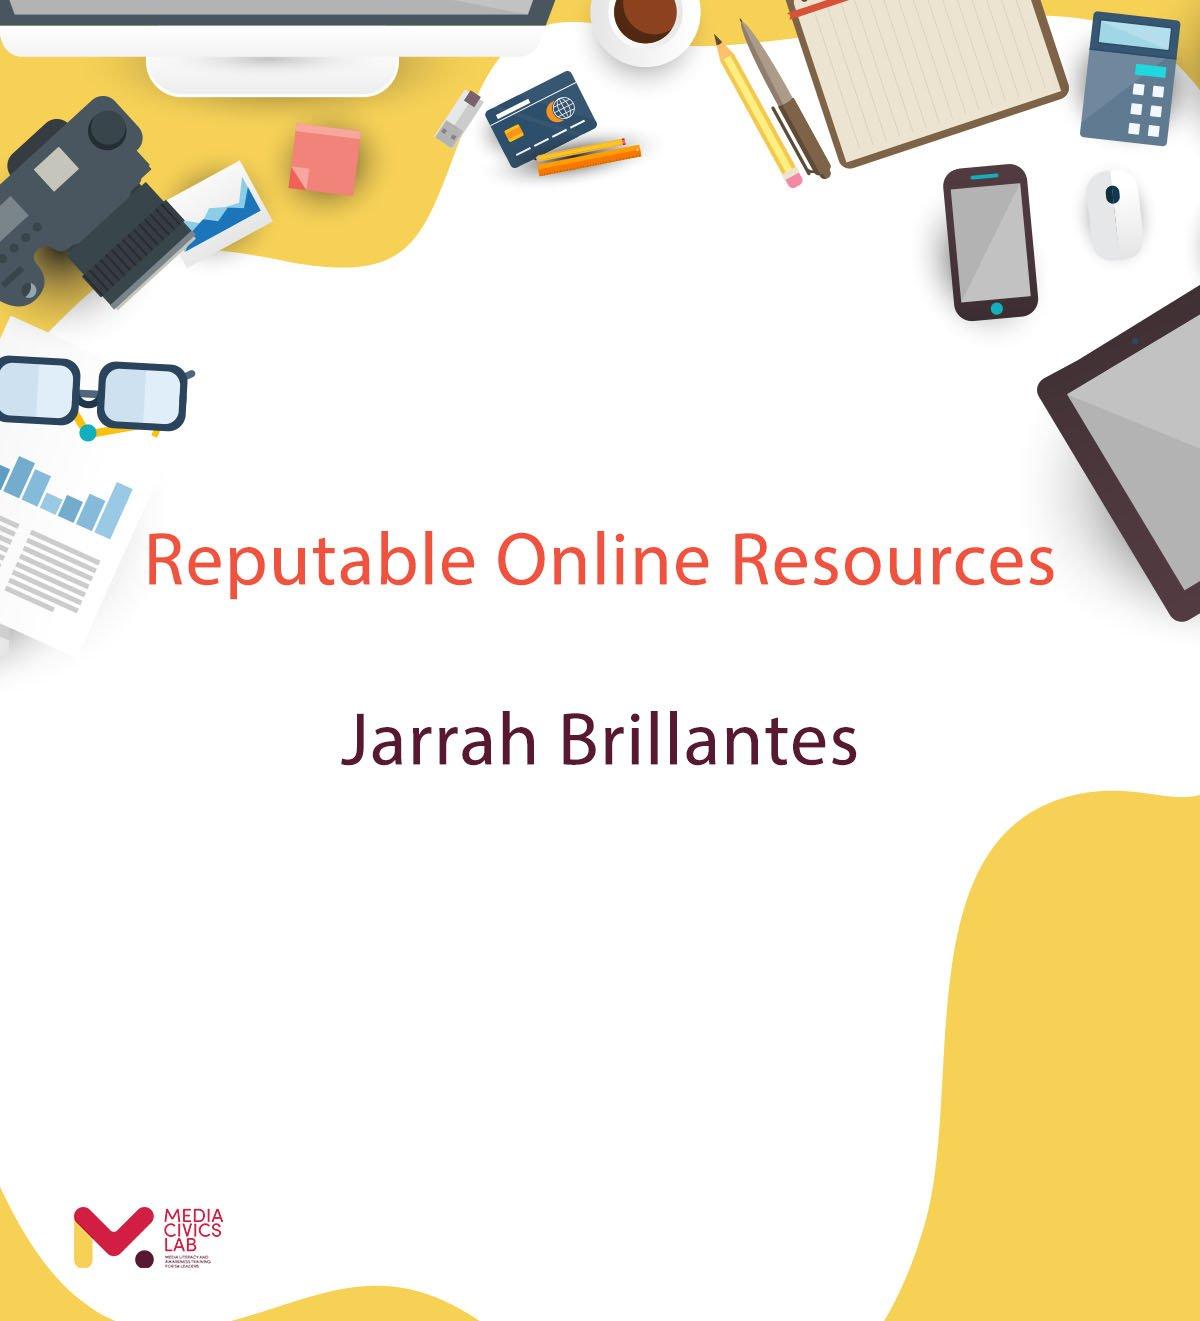 Reputable Online Resources – Jarrah Brillantes